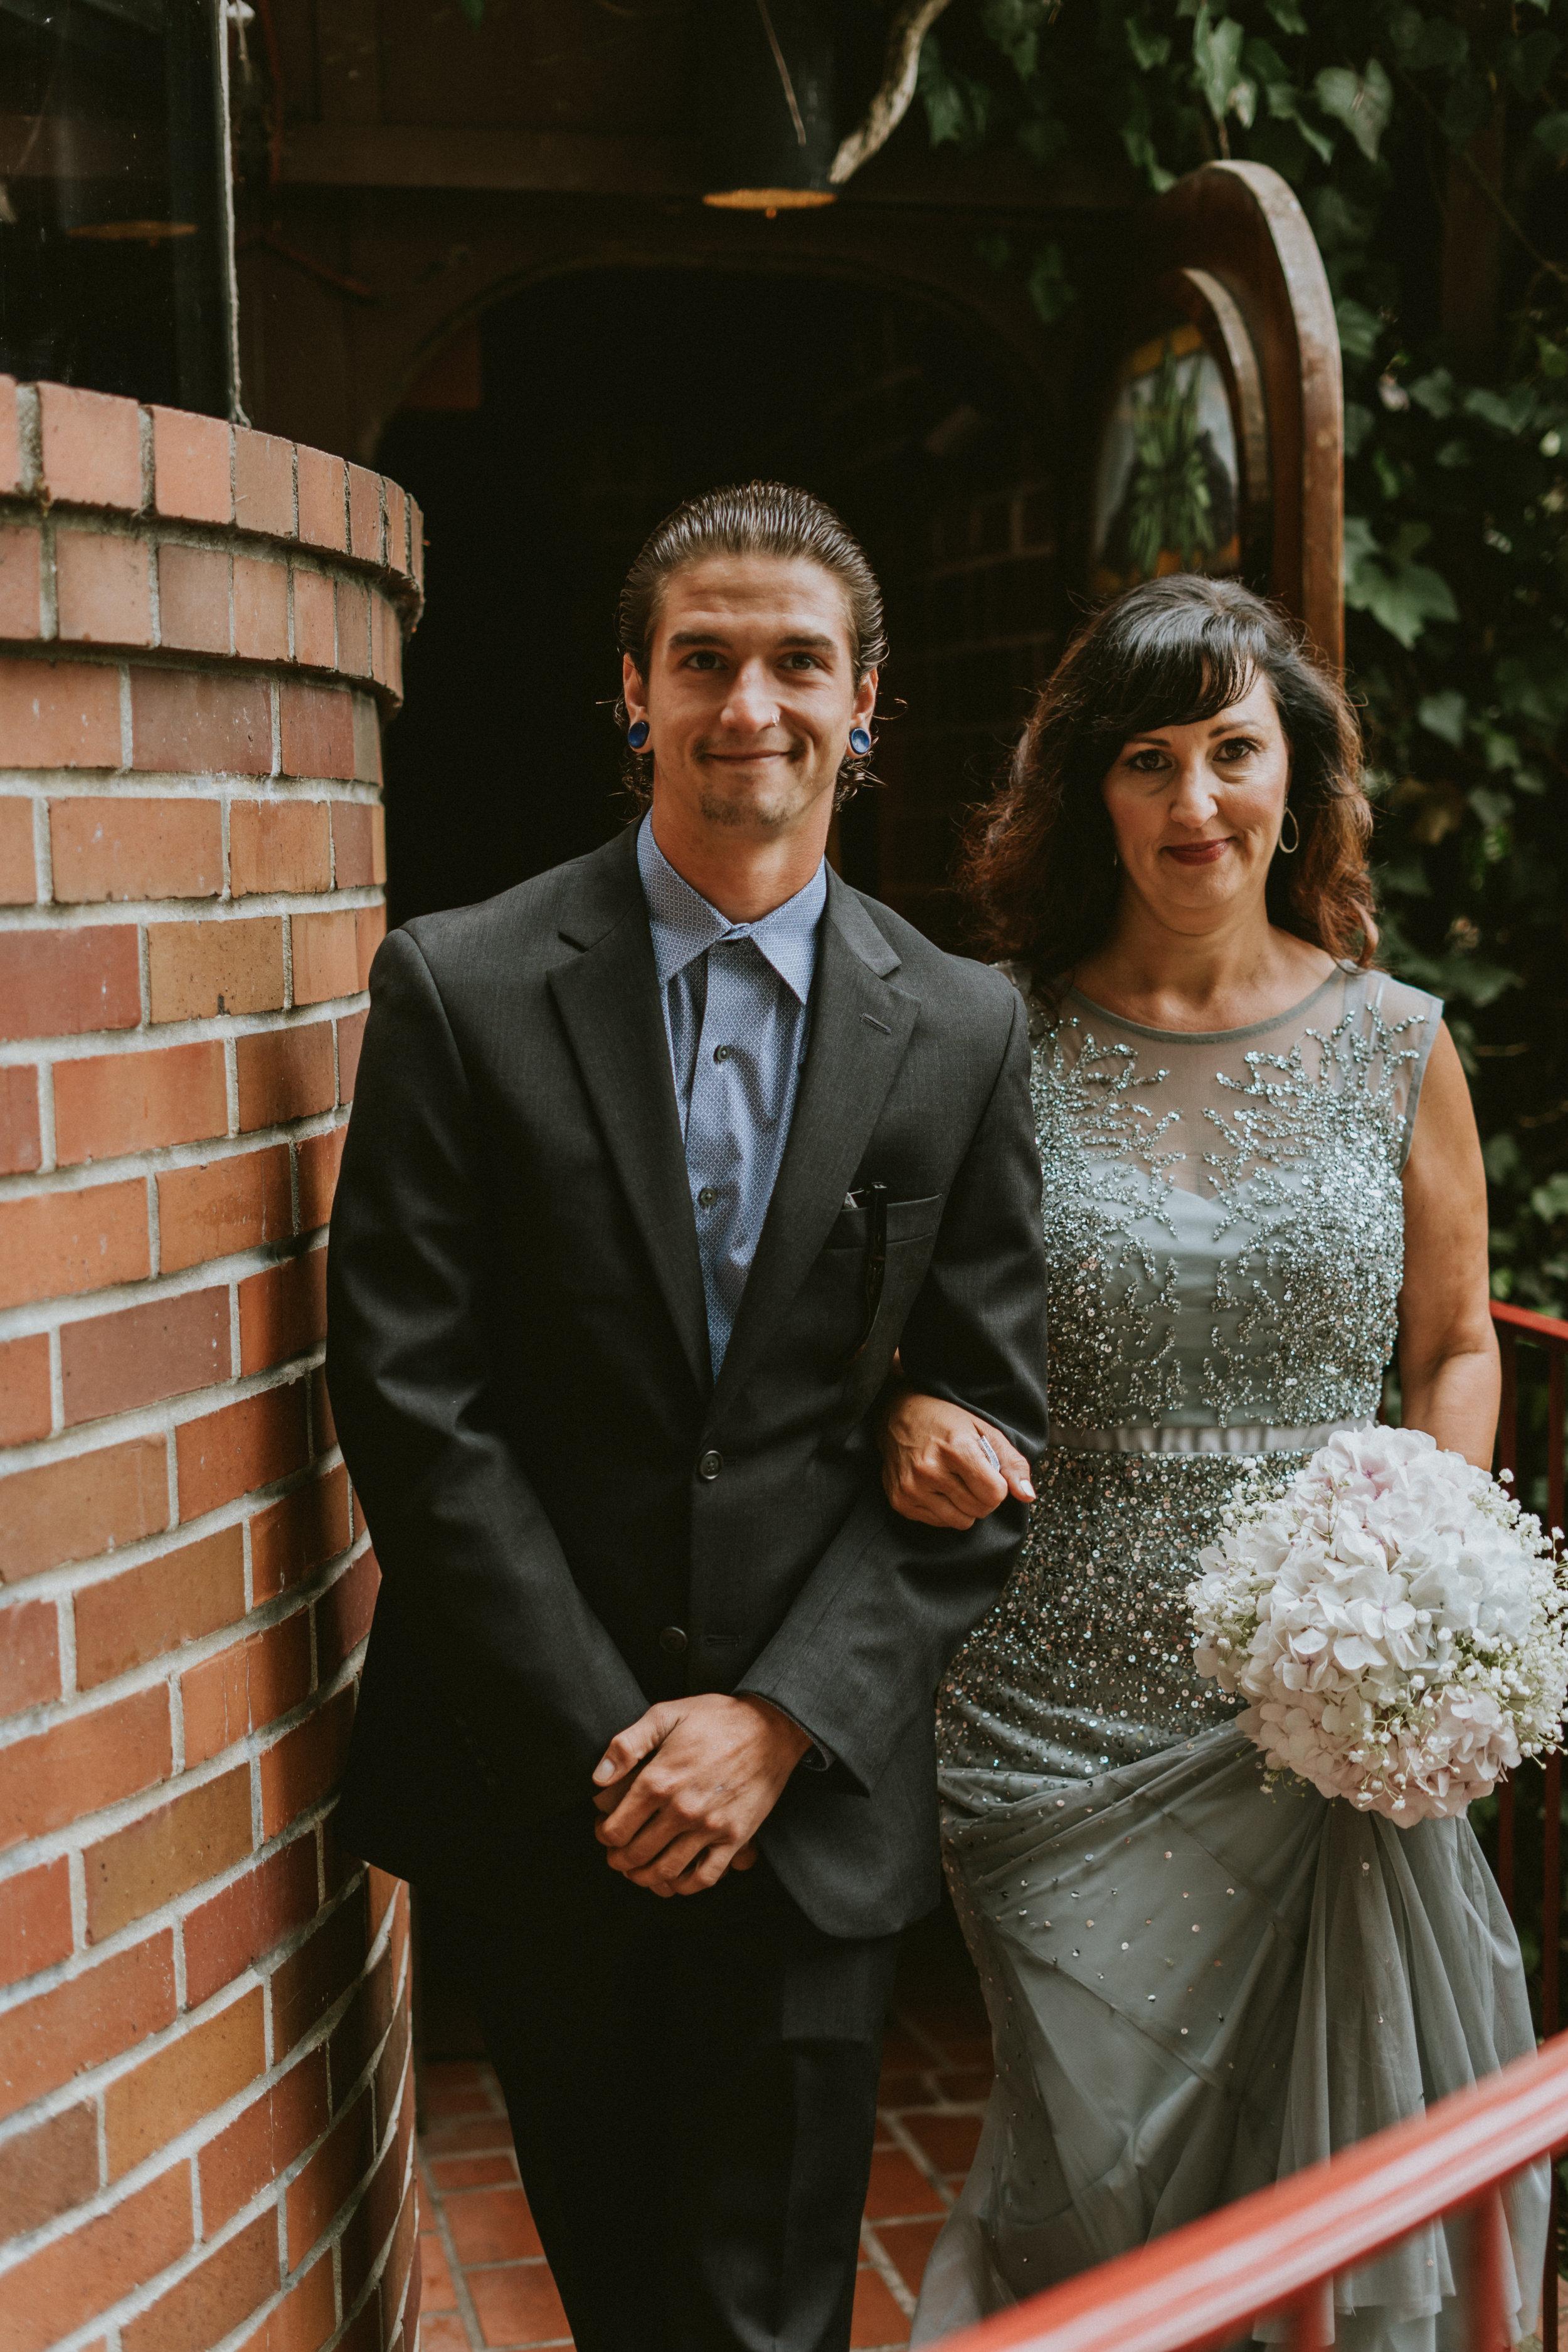 Capitola-Santa-Cruz-wedding-photographer-140.jpg